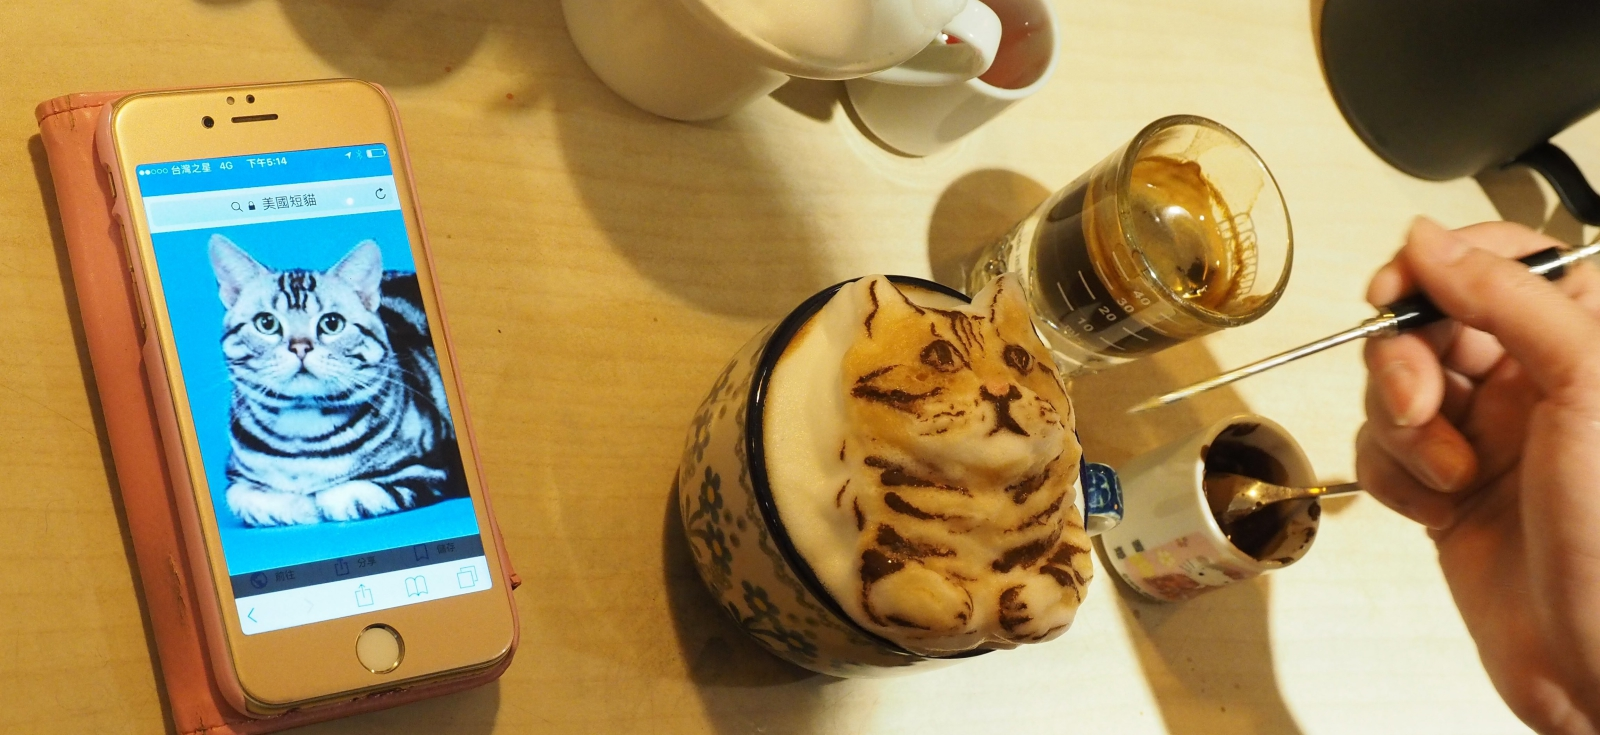 Tajlandia, rysunek 3D na filiżance kawy EPA/DAVID CHANG